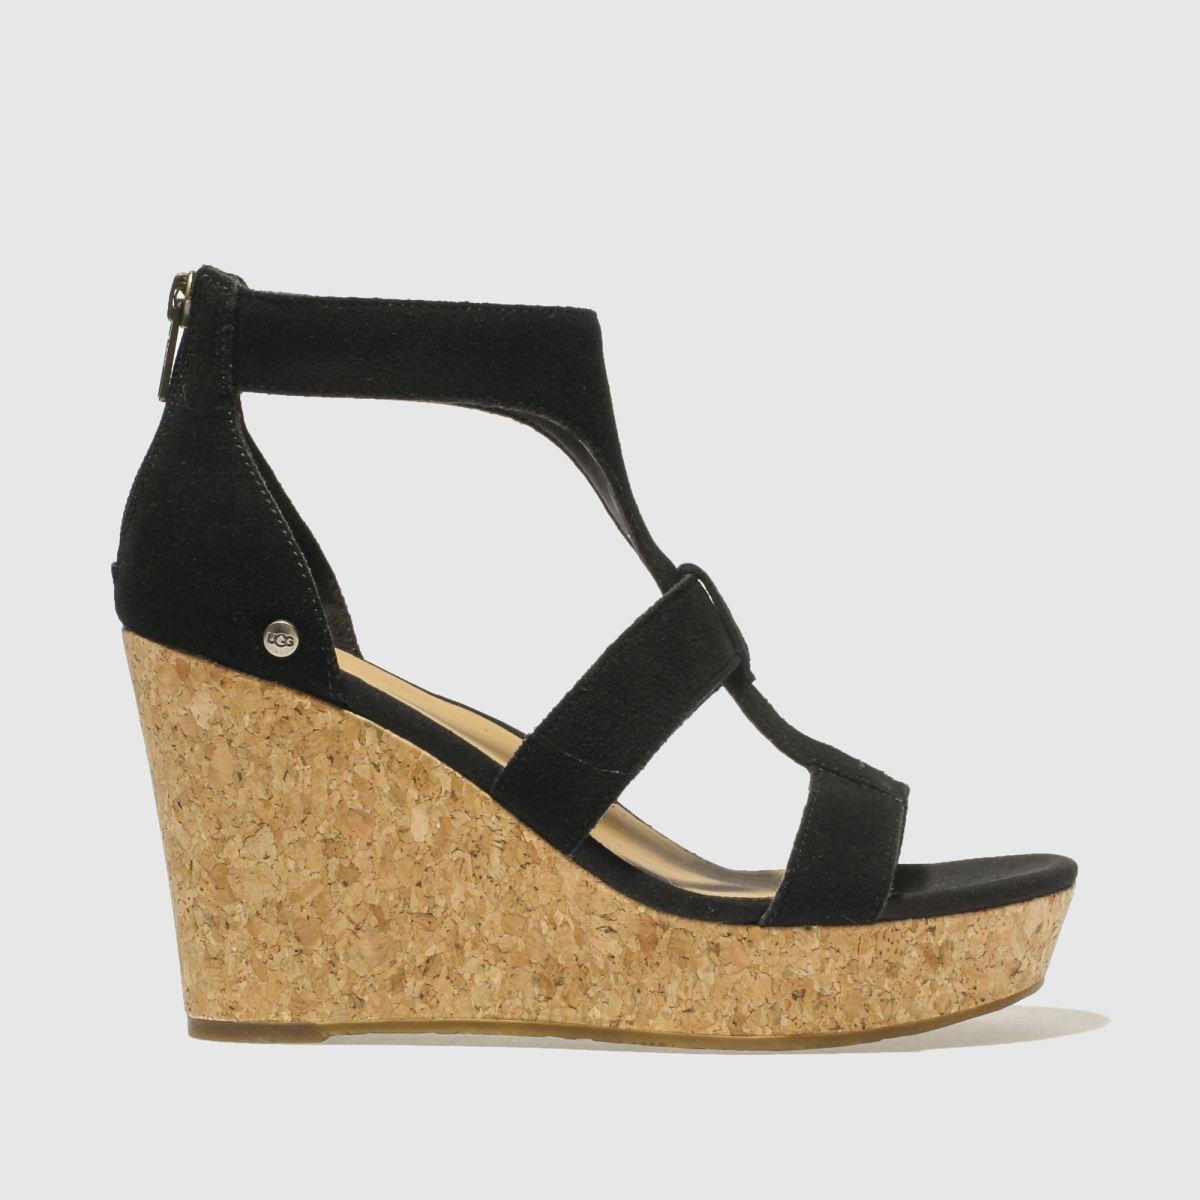 Ugg Black Whitney Sandals